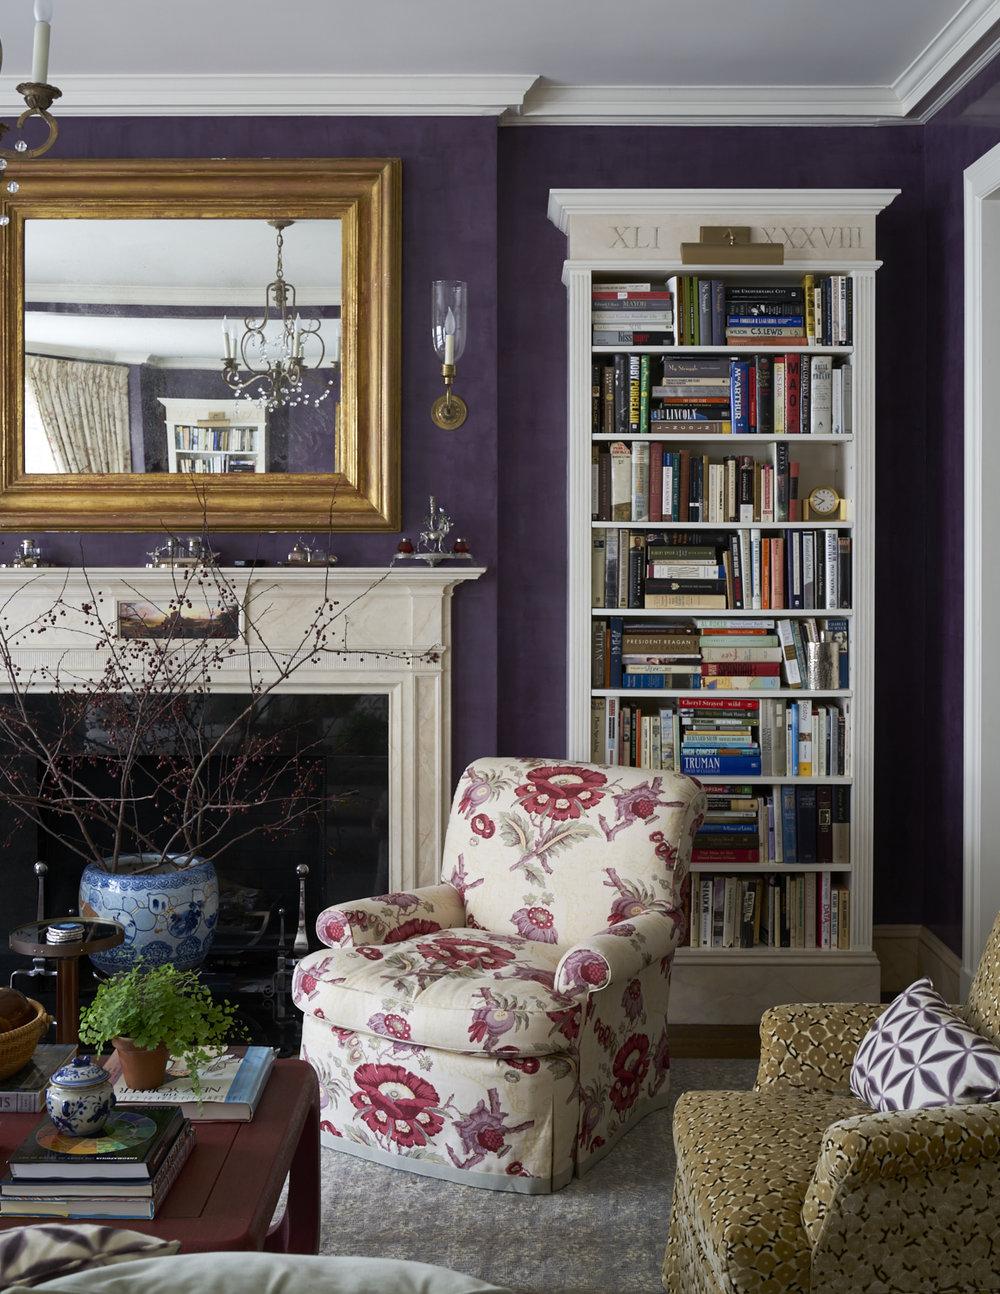 2 Living Room 2 HB_Katie_Lydon_Rubin_Residence_005 copy.jpg